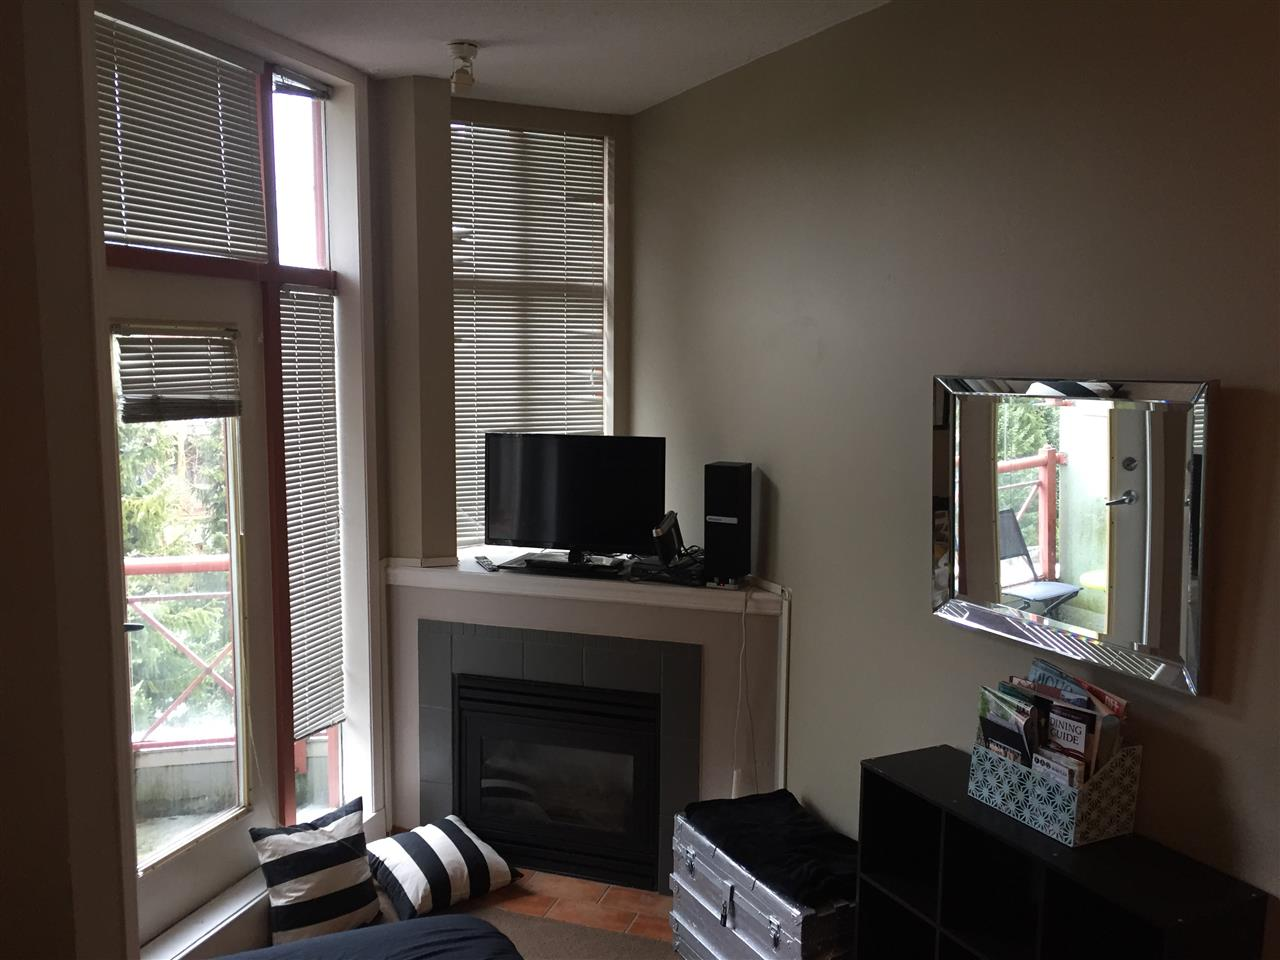 Condo Apartment at 320 4369 MAIN STREET, Unit 320, Whistler, British Columbia. Image 1